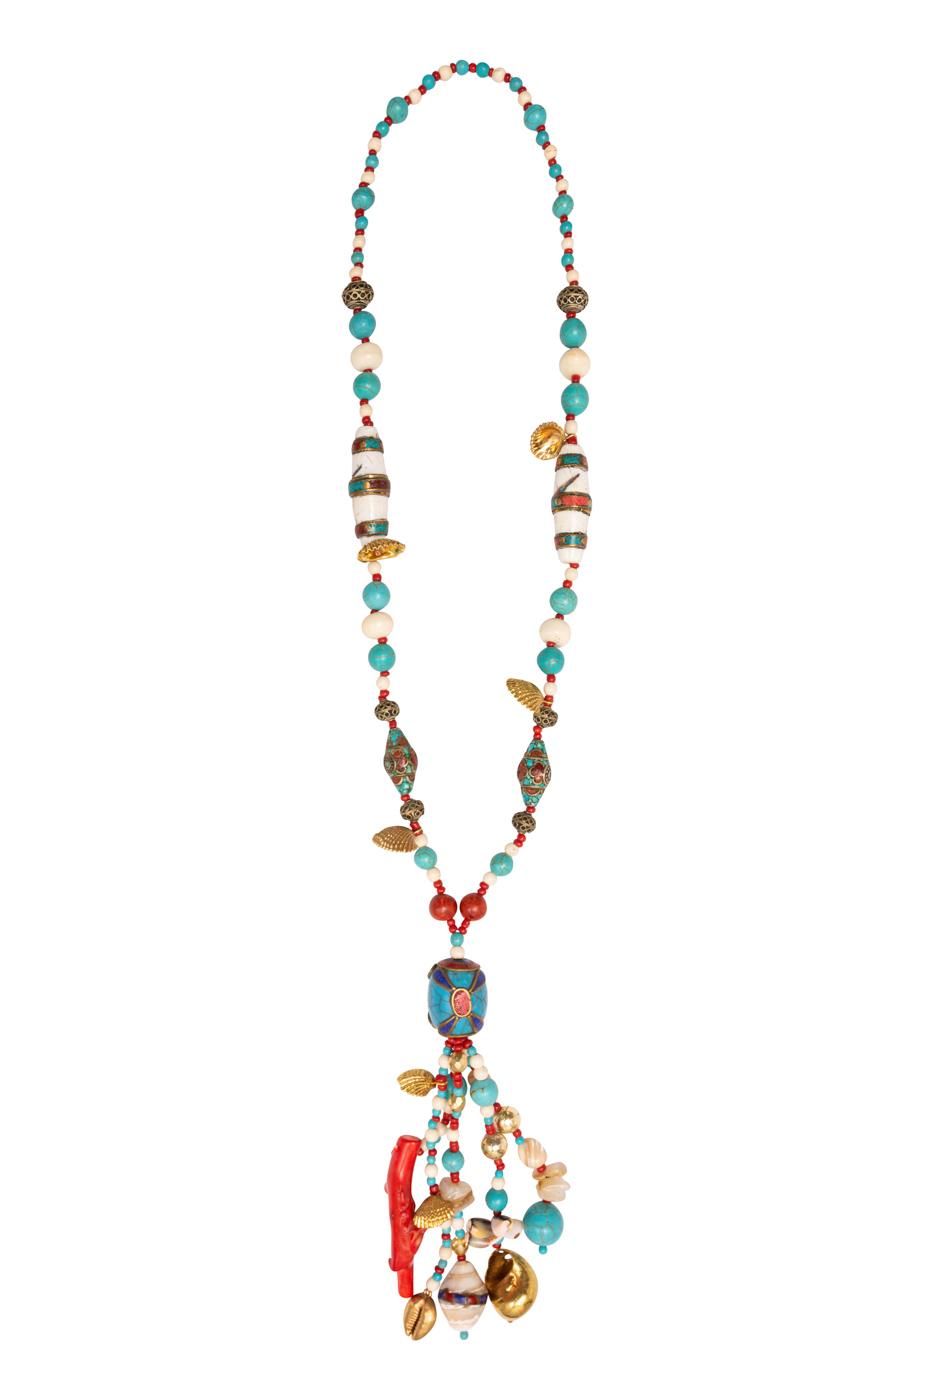 Collar turquesa,coral rojo y caracoles naturales